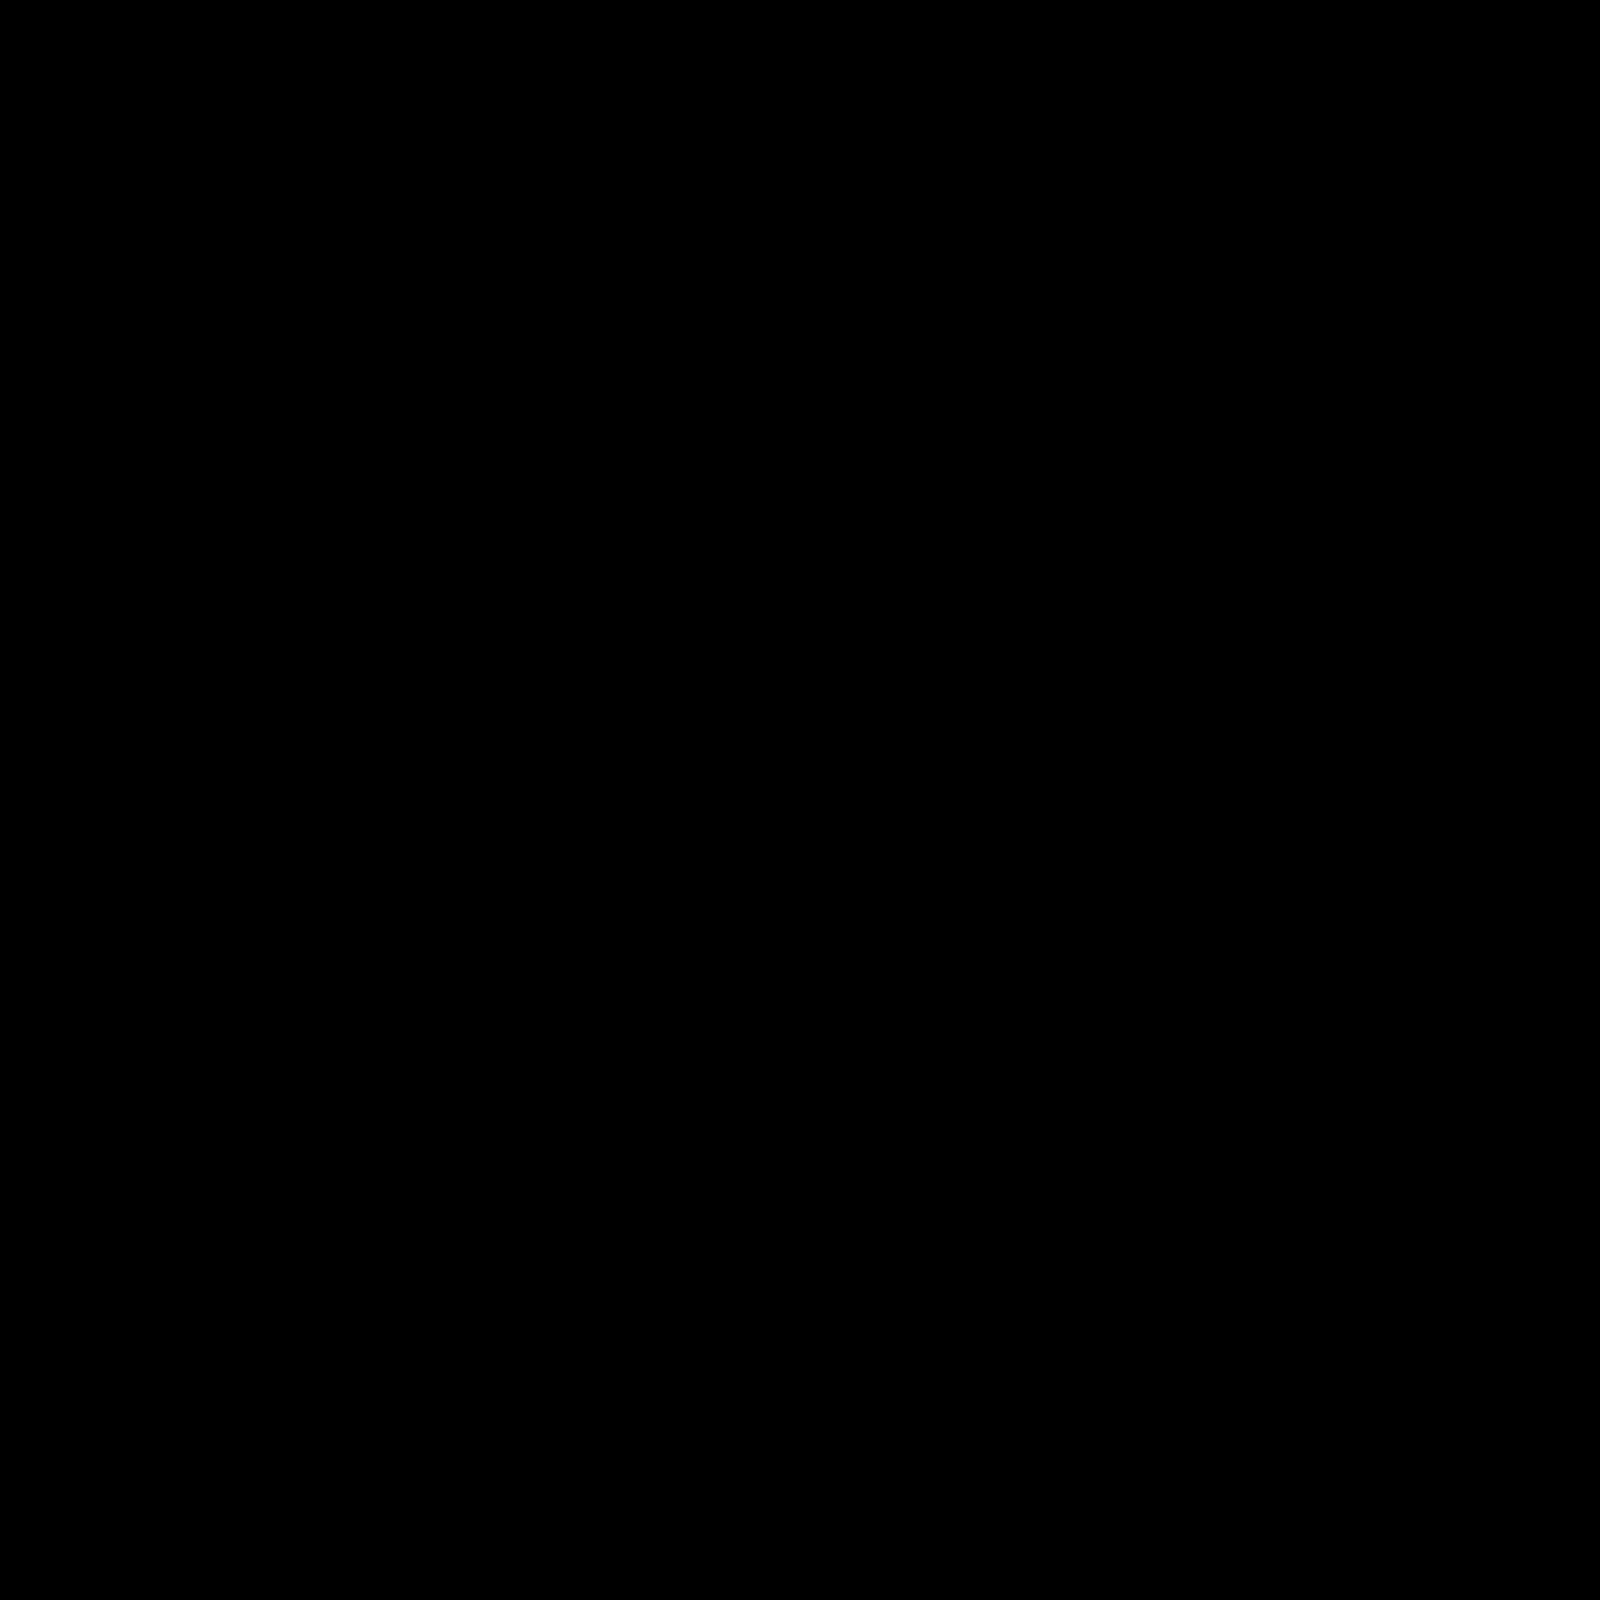 Баскетбол Джерси icon